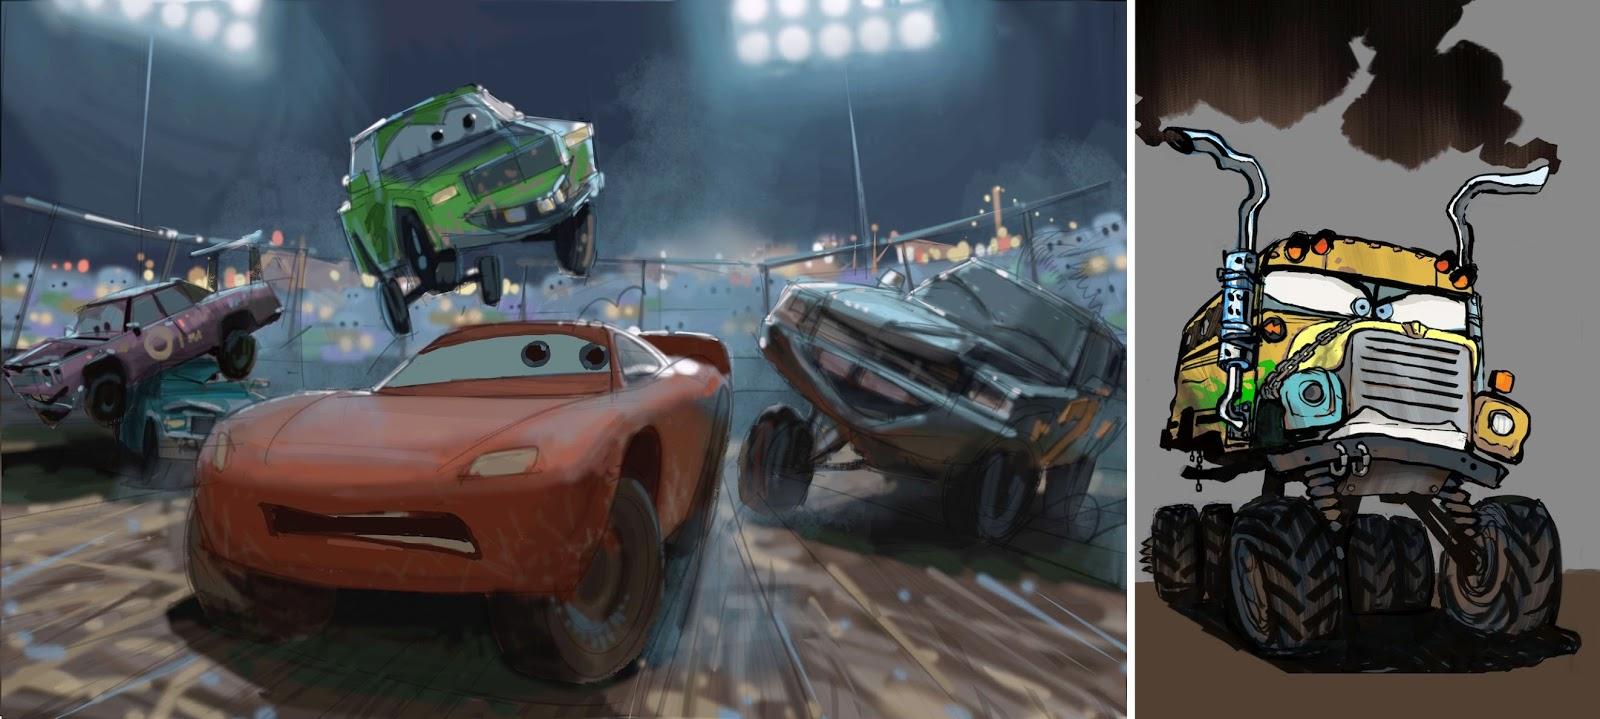 Mcqueen S Return Go Behind The Scenes Of Cars 3 Amp Read